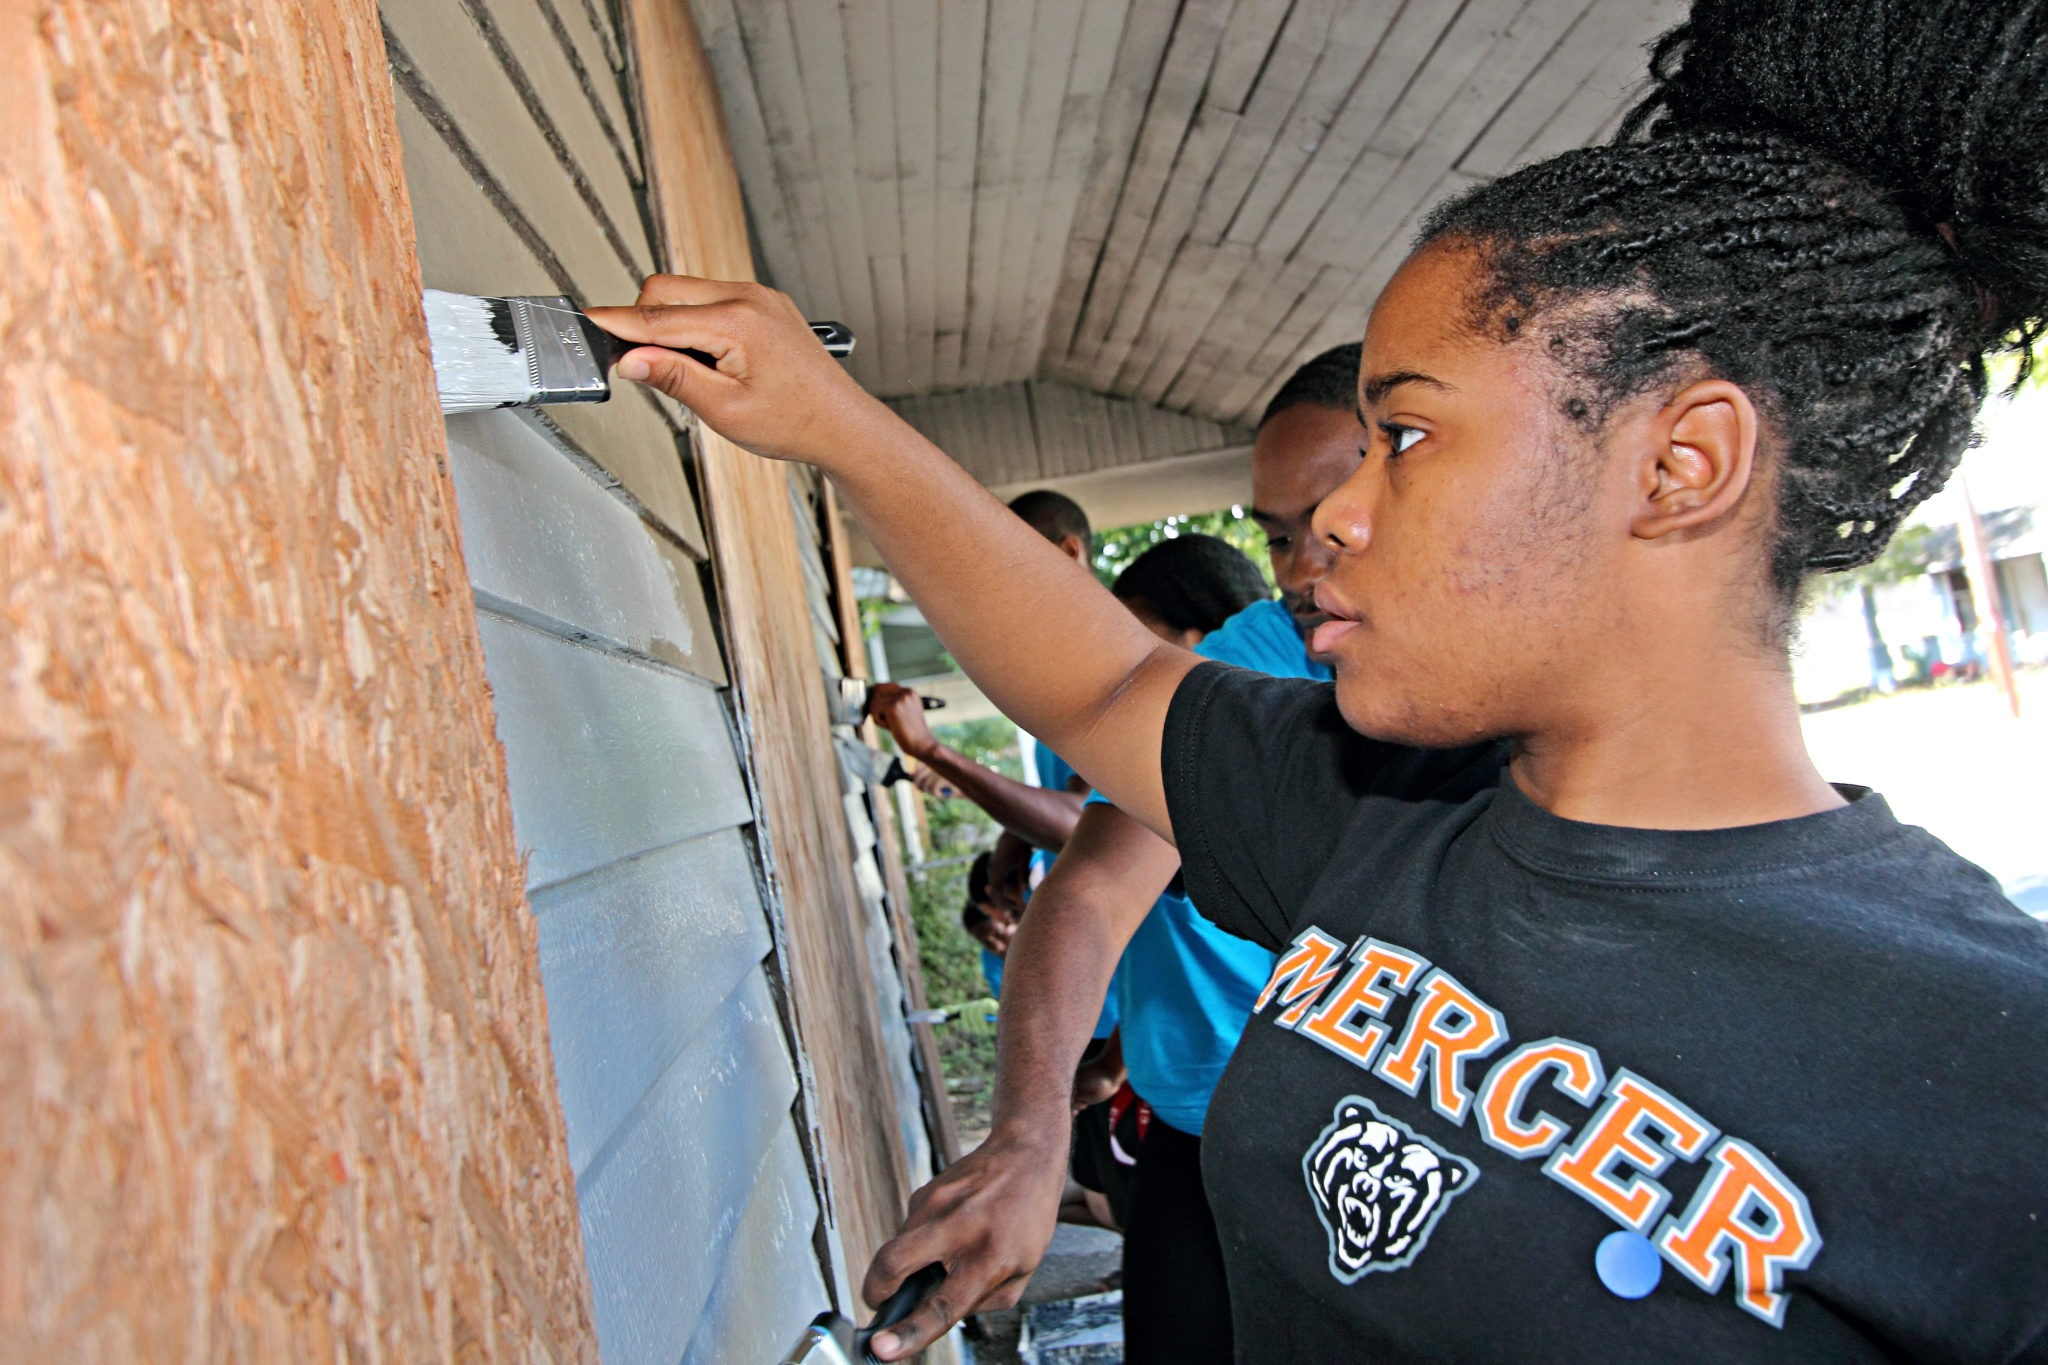 A Mercer University student paints a house.